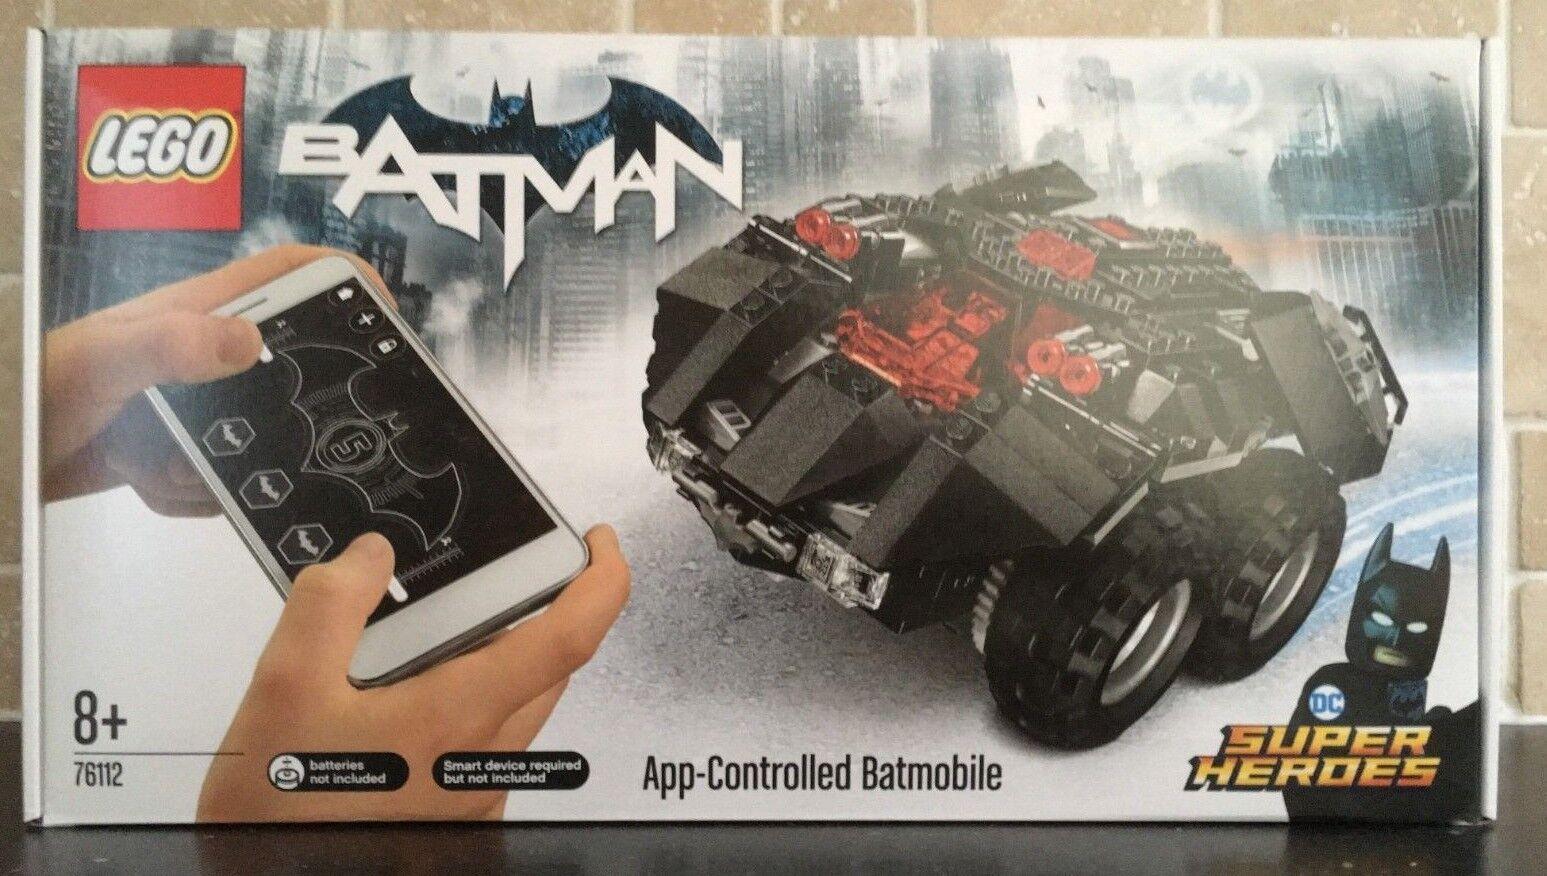 LEGO DC SUPER HEROES -76112 BATMAN App-Controlled Batmobile Brand New & Sealed